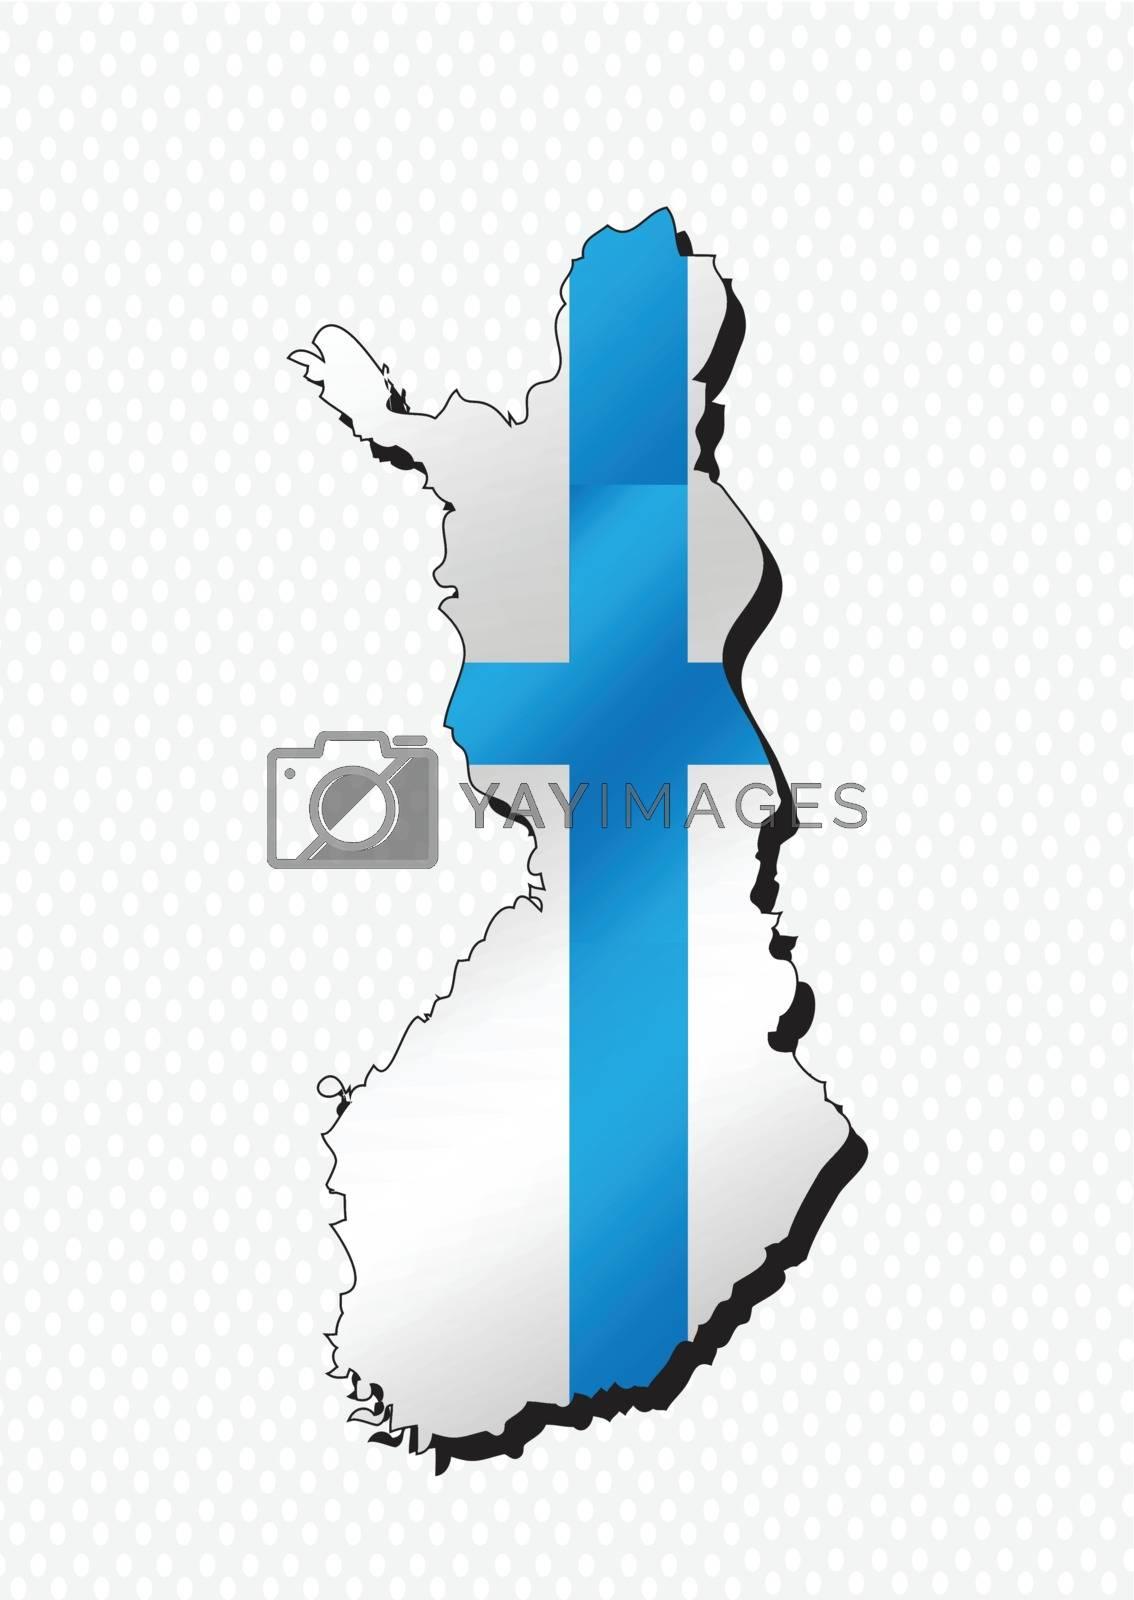 Finland map and flag idea design by kiddaikiddee